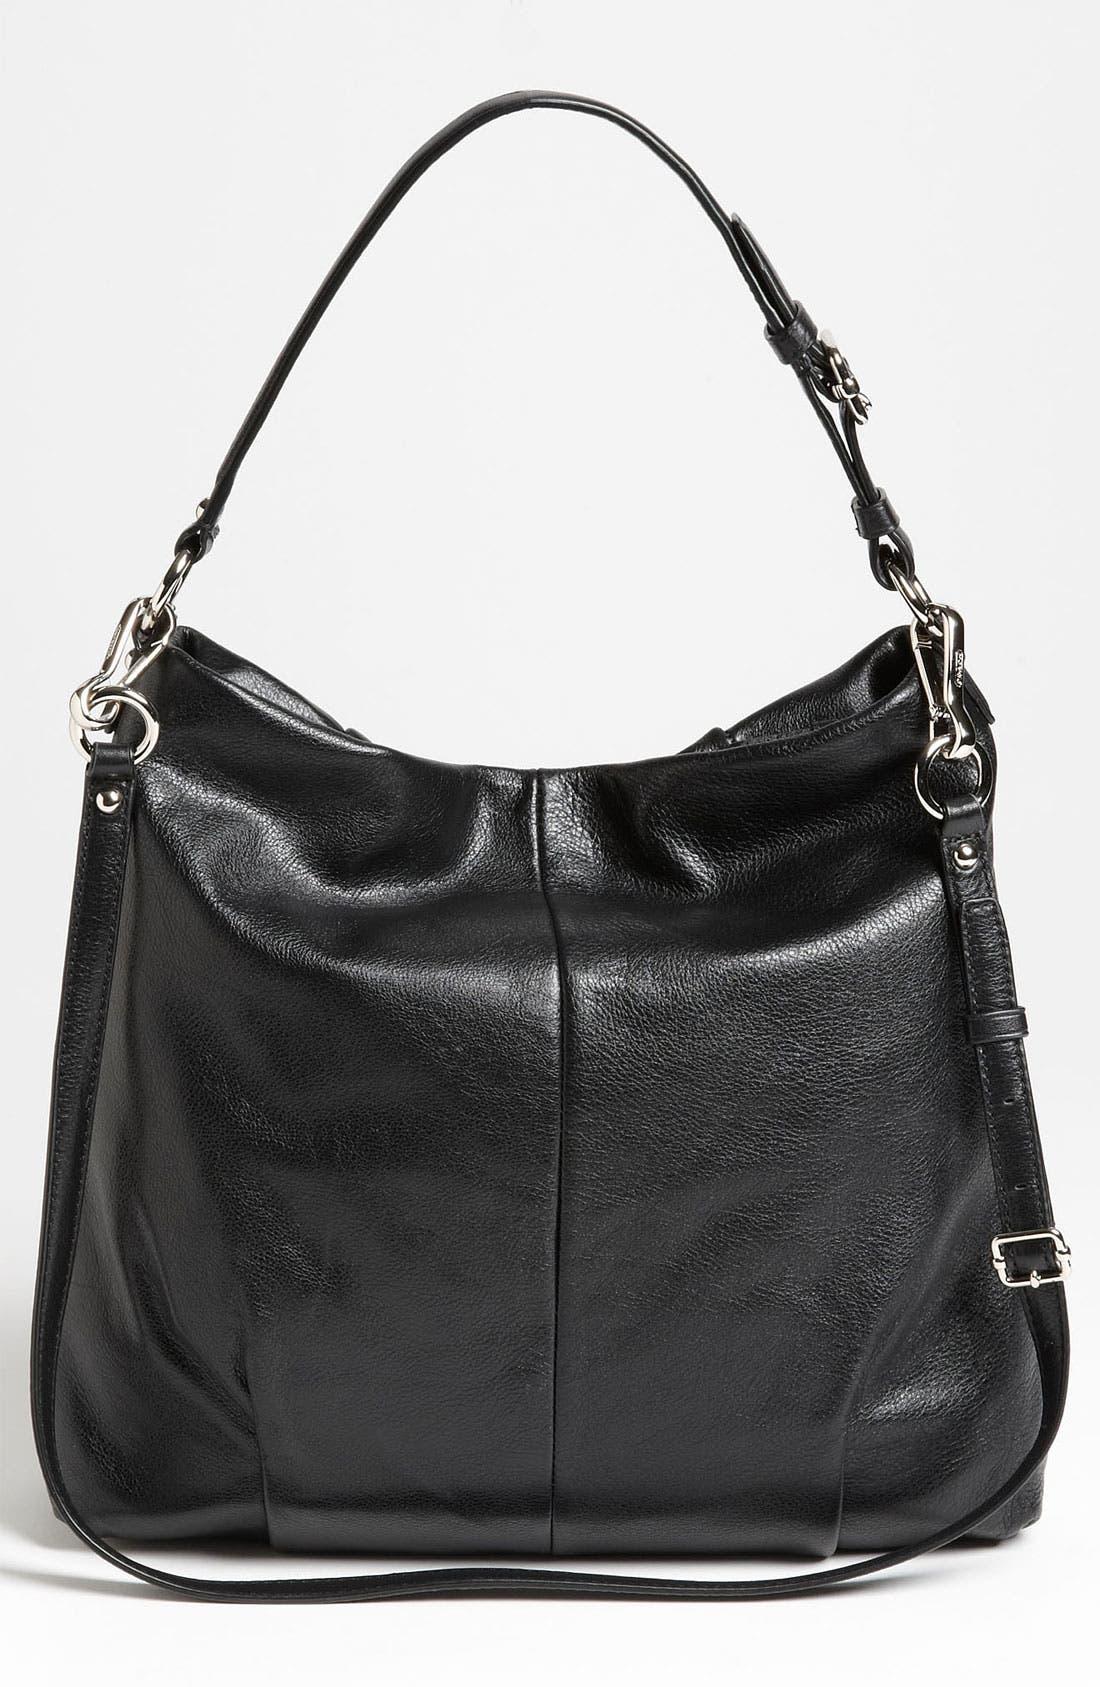 COACH,                             'New Madison - Isabelle' Leather Shoulder Bag,                             Alternate thumbnail 2, color,                             001